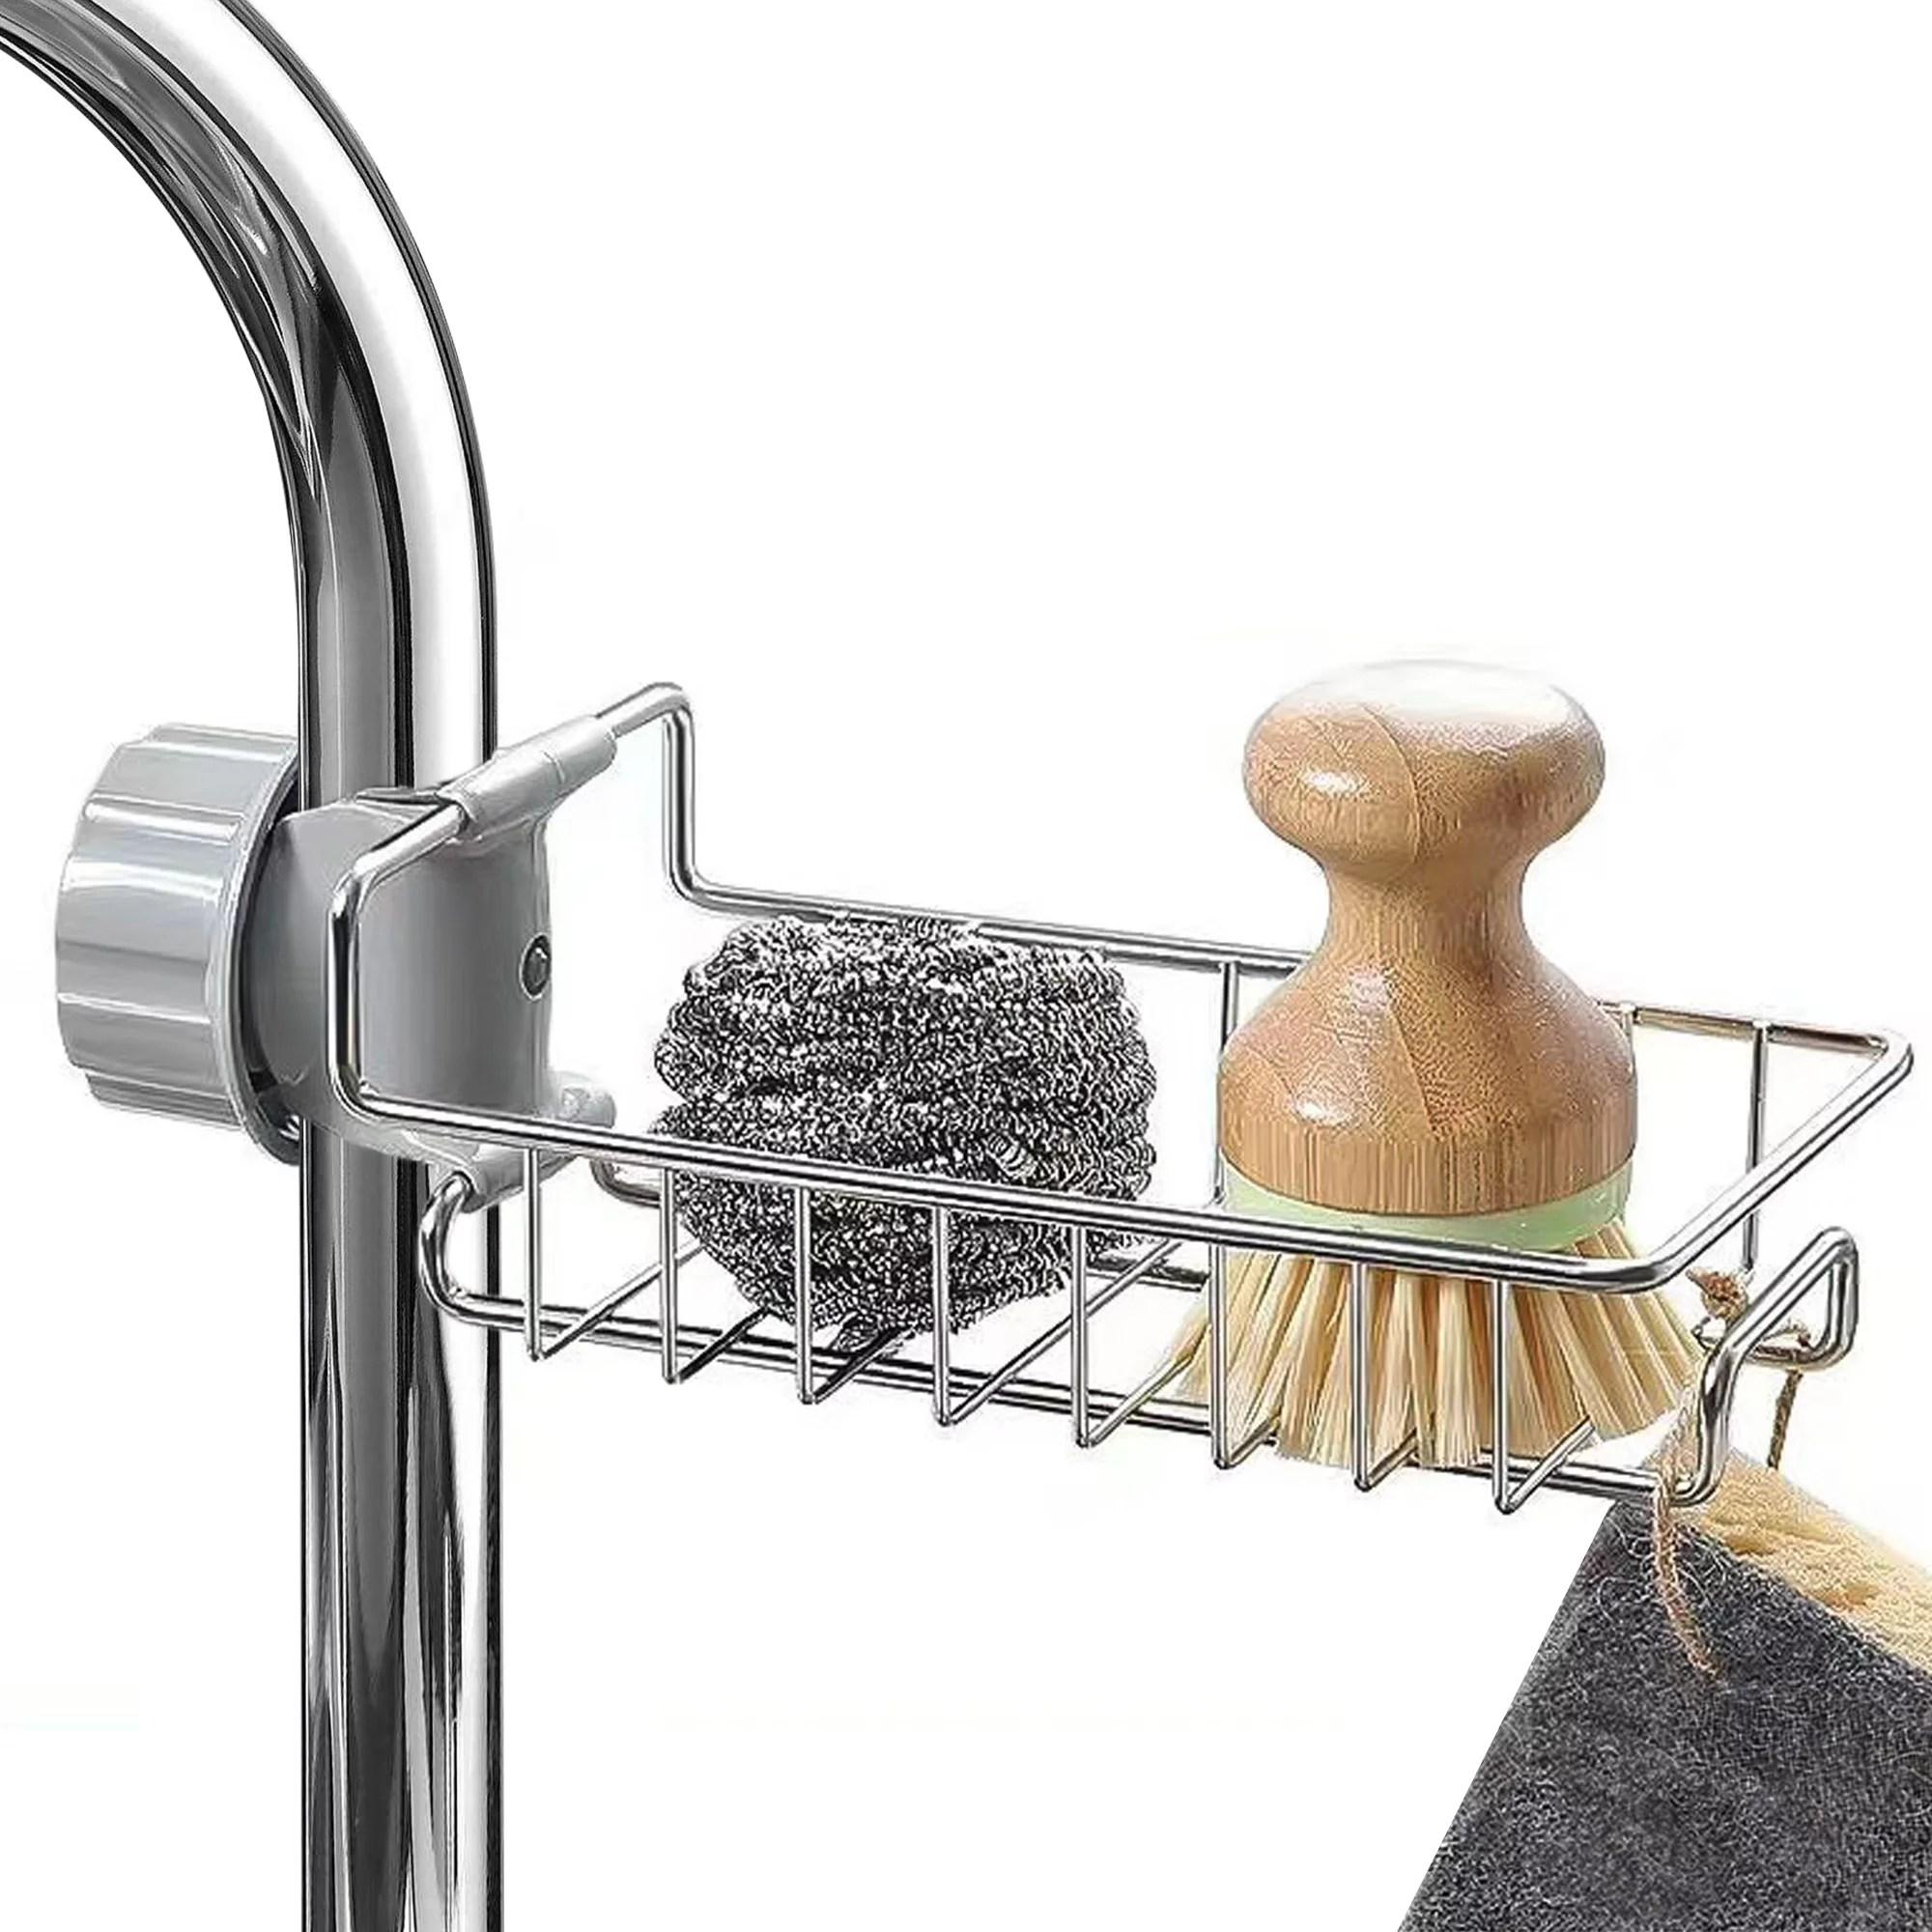 kitchen sponge holder bigroof stainless steel sink holder dish brush sink caddy basket for kitchen sink